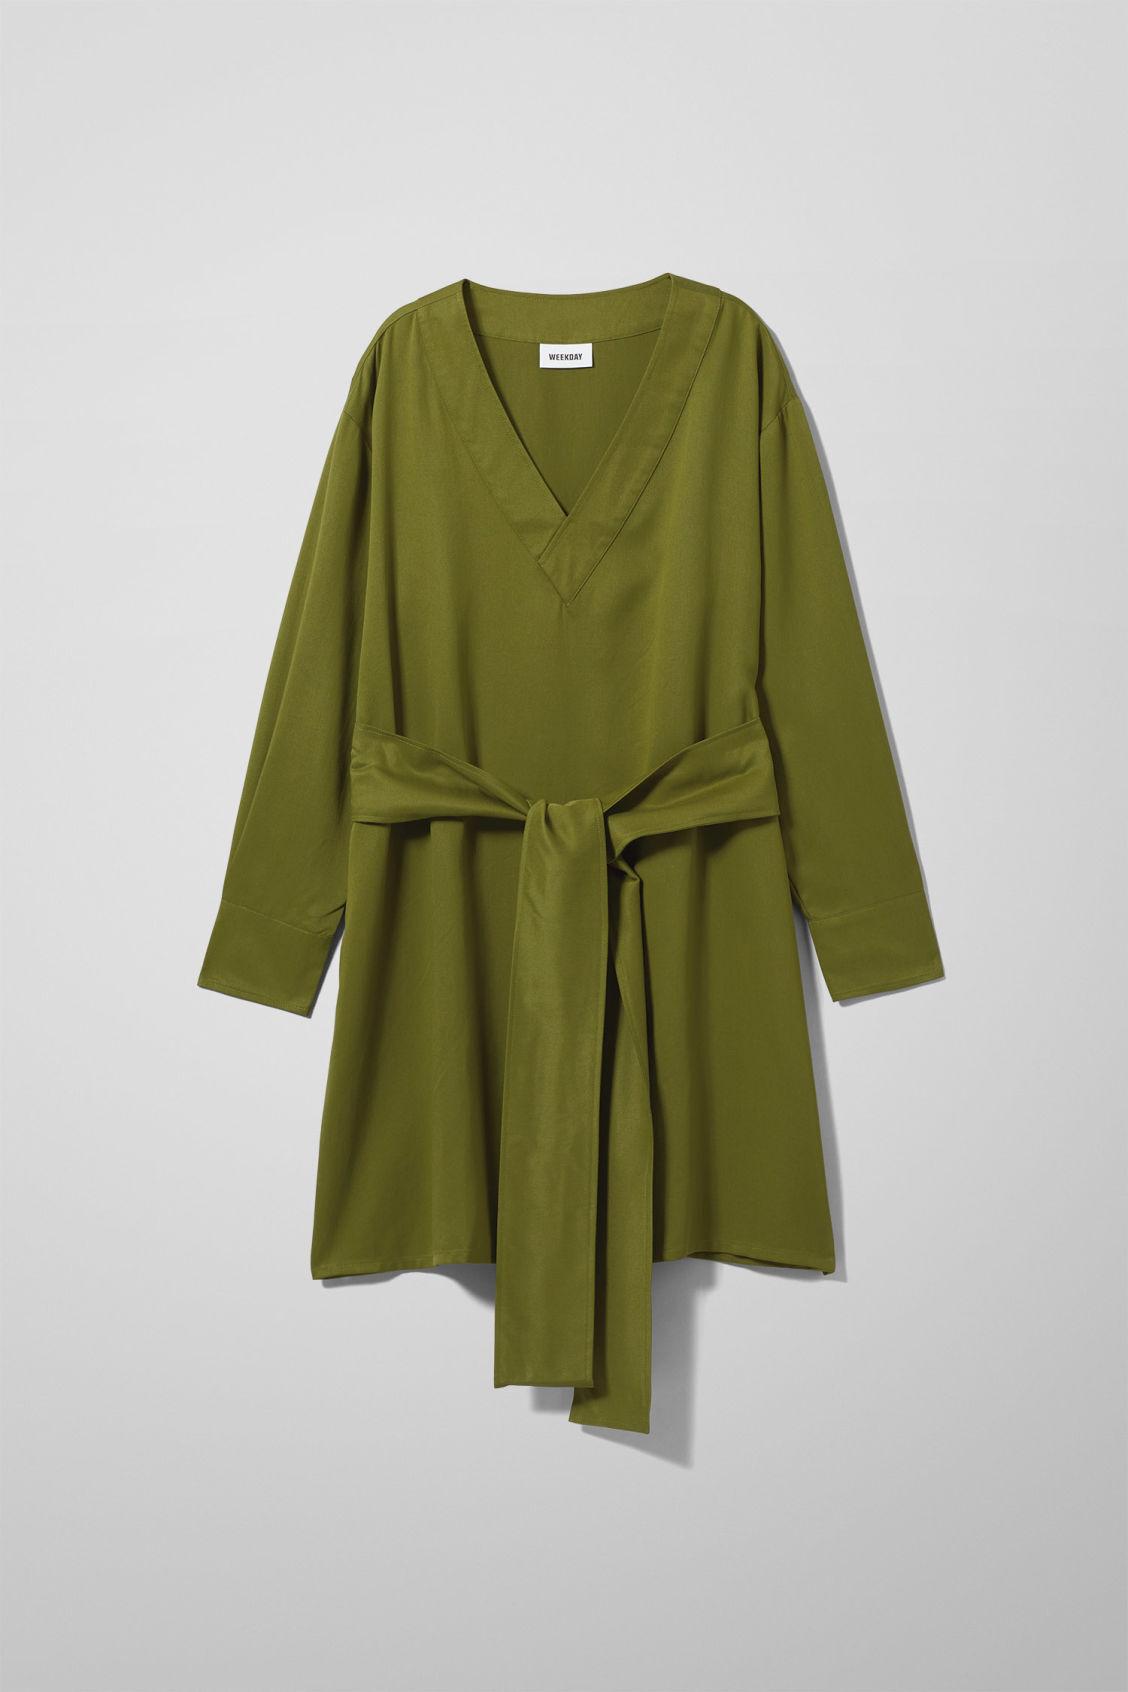 Image of Baba Dress - Green-XS